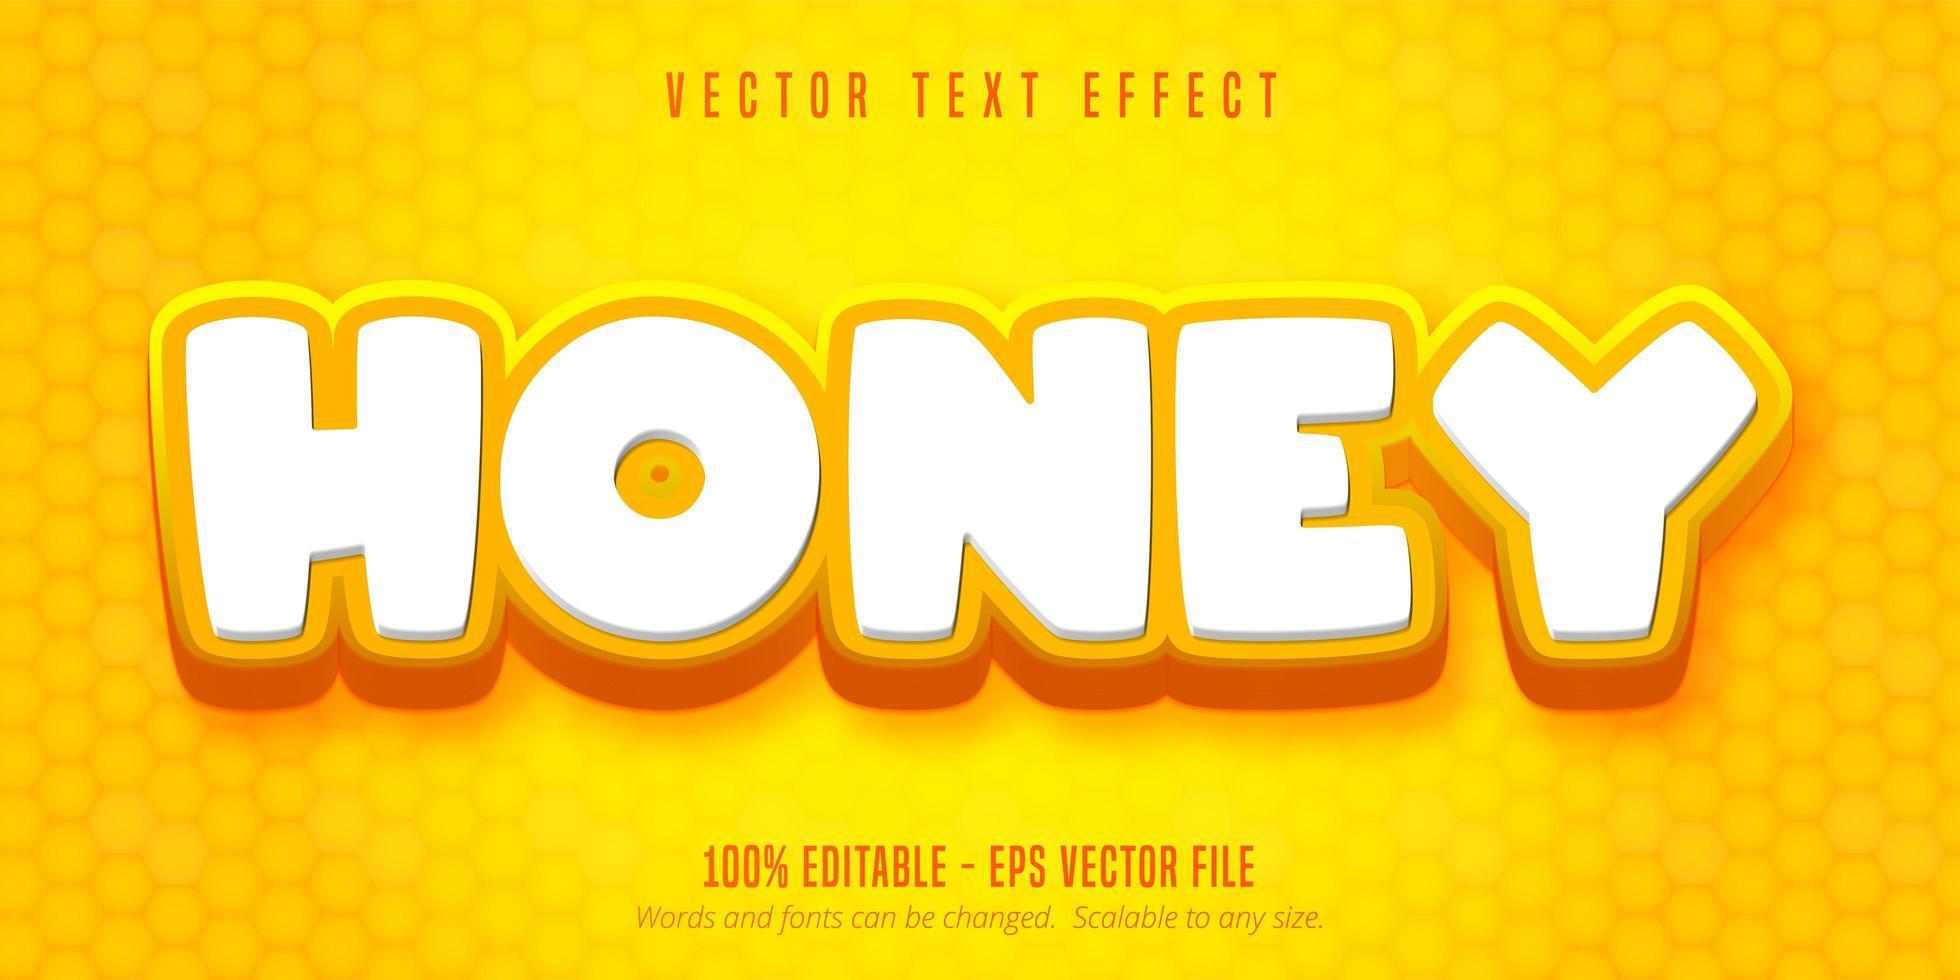 Honey Text, Cartoon Style Text Effect vector